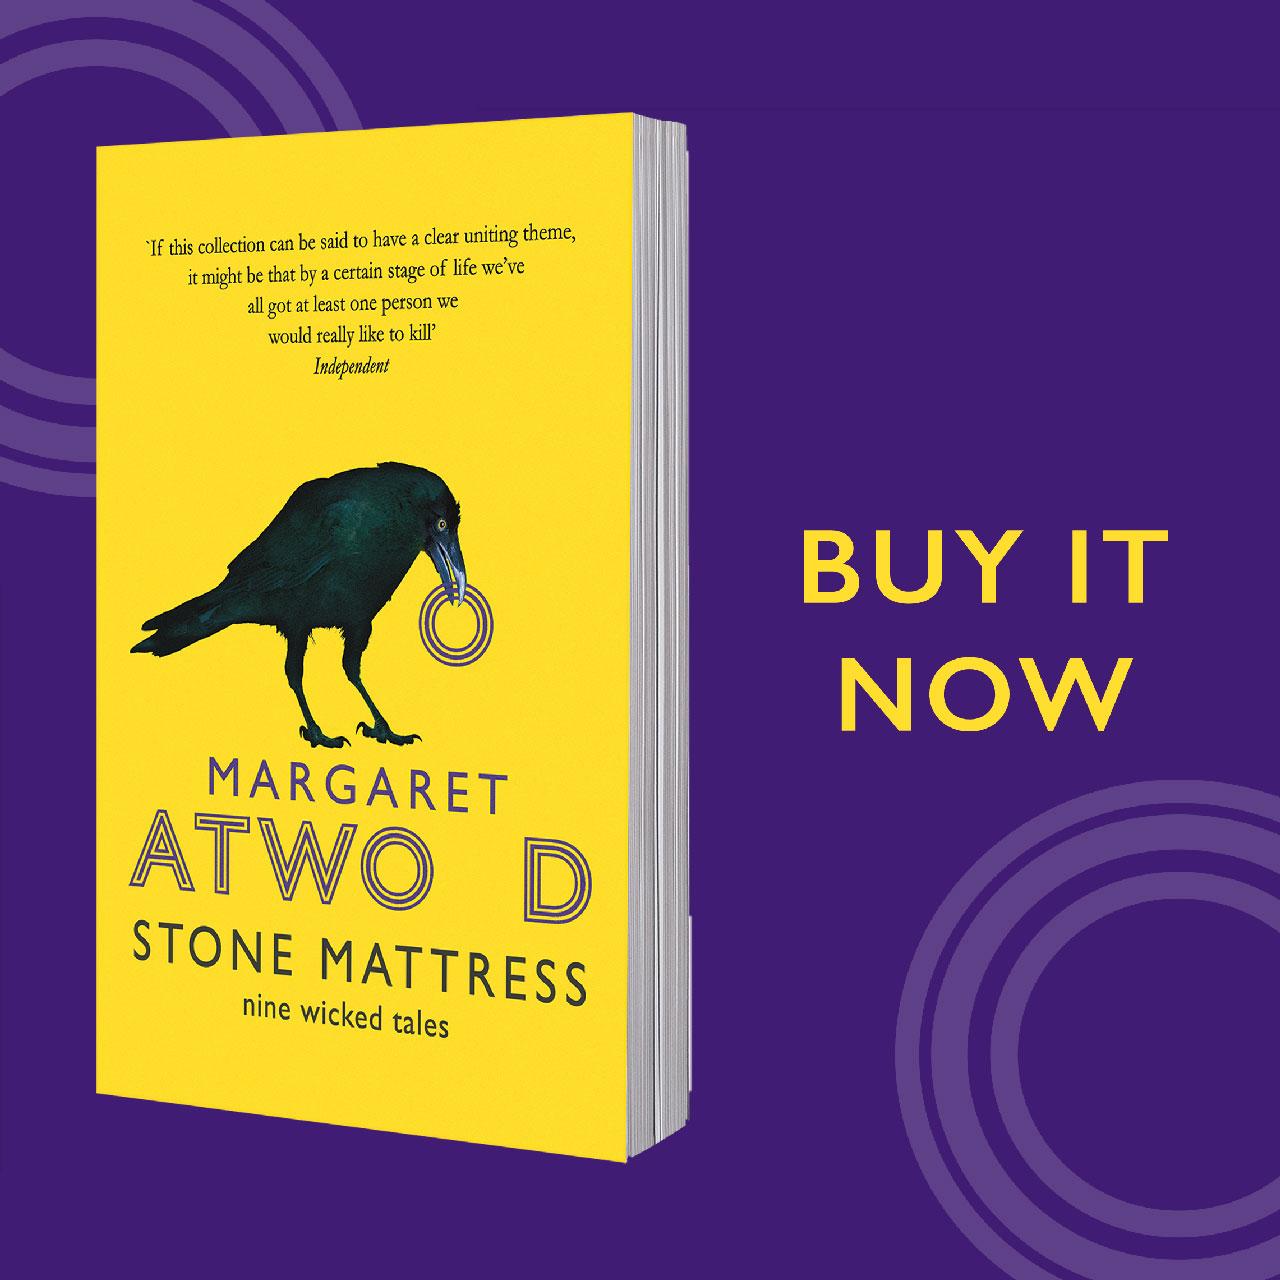 margaret atwwod stone mattress animation